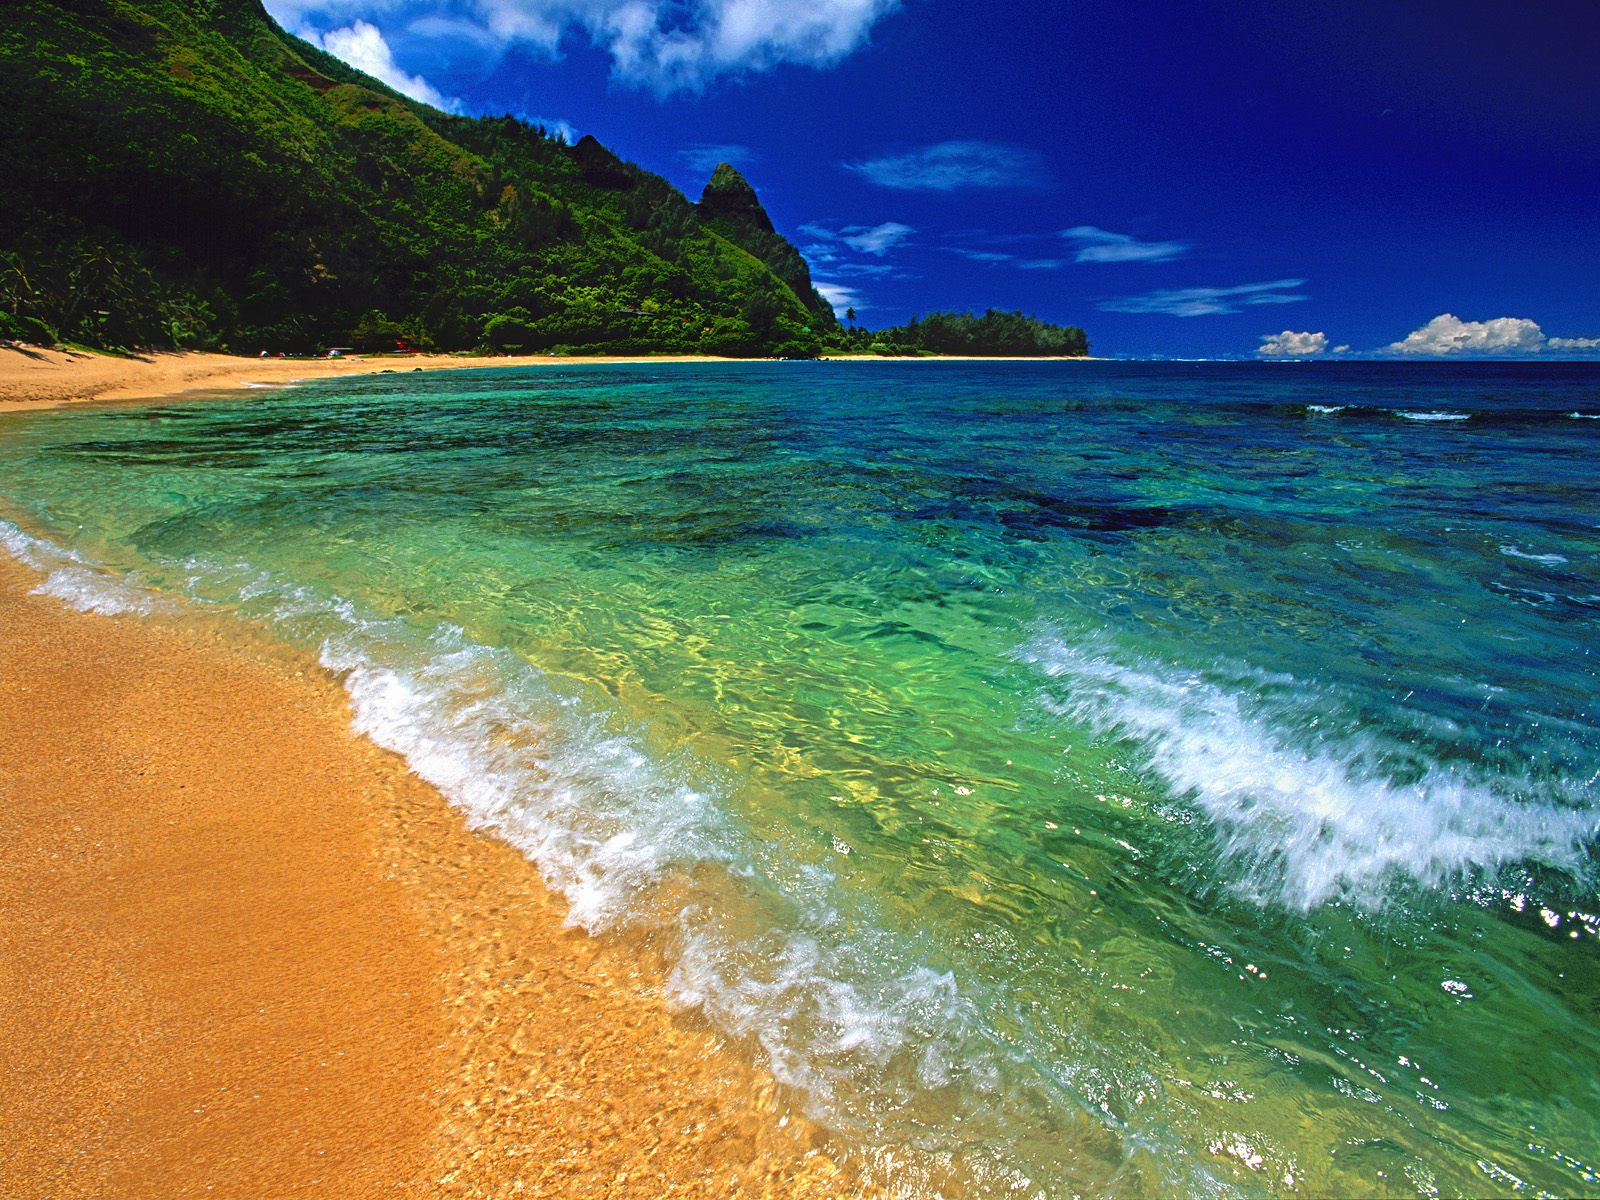 http://hawaiitancok.hu/wp-content/uploads/2017/01/7-0.jpg